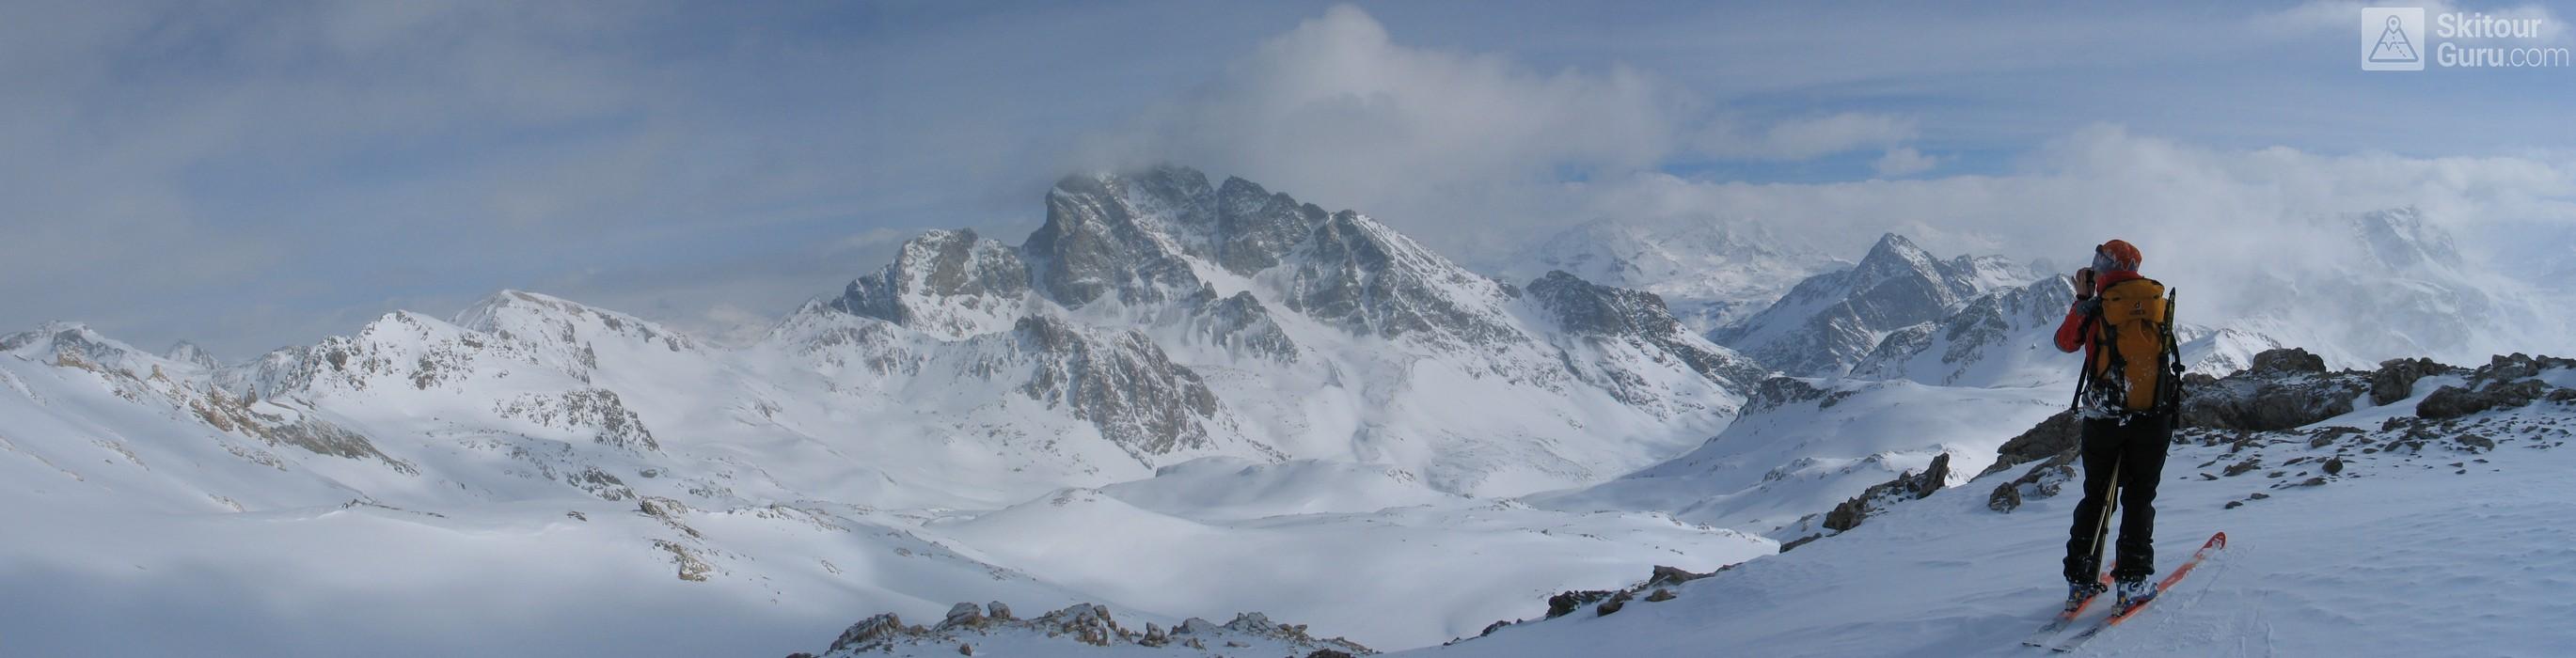 Piz Surgonda Albula Alpen Švýcarsko panorama 11